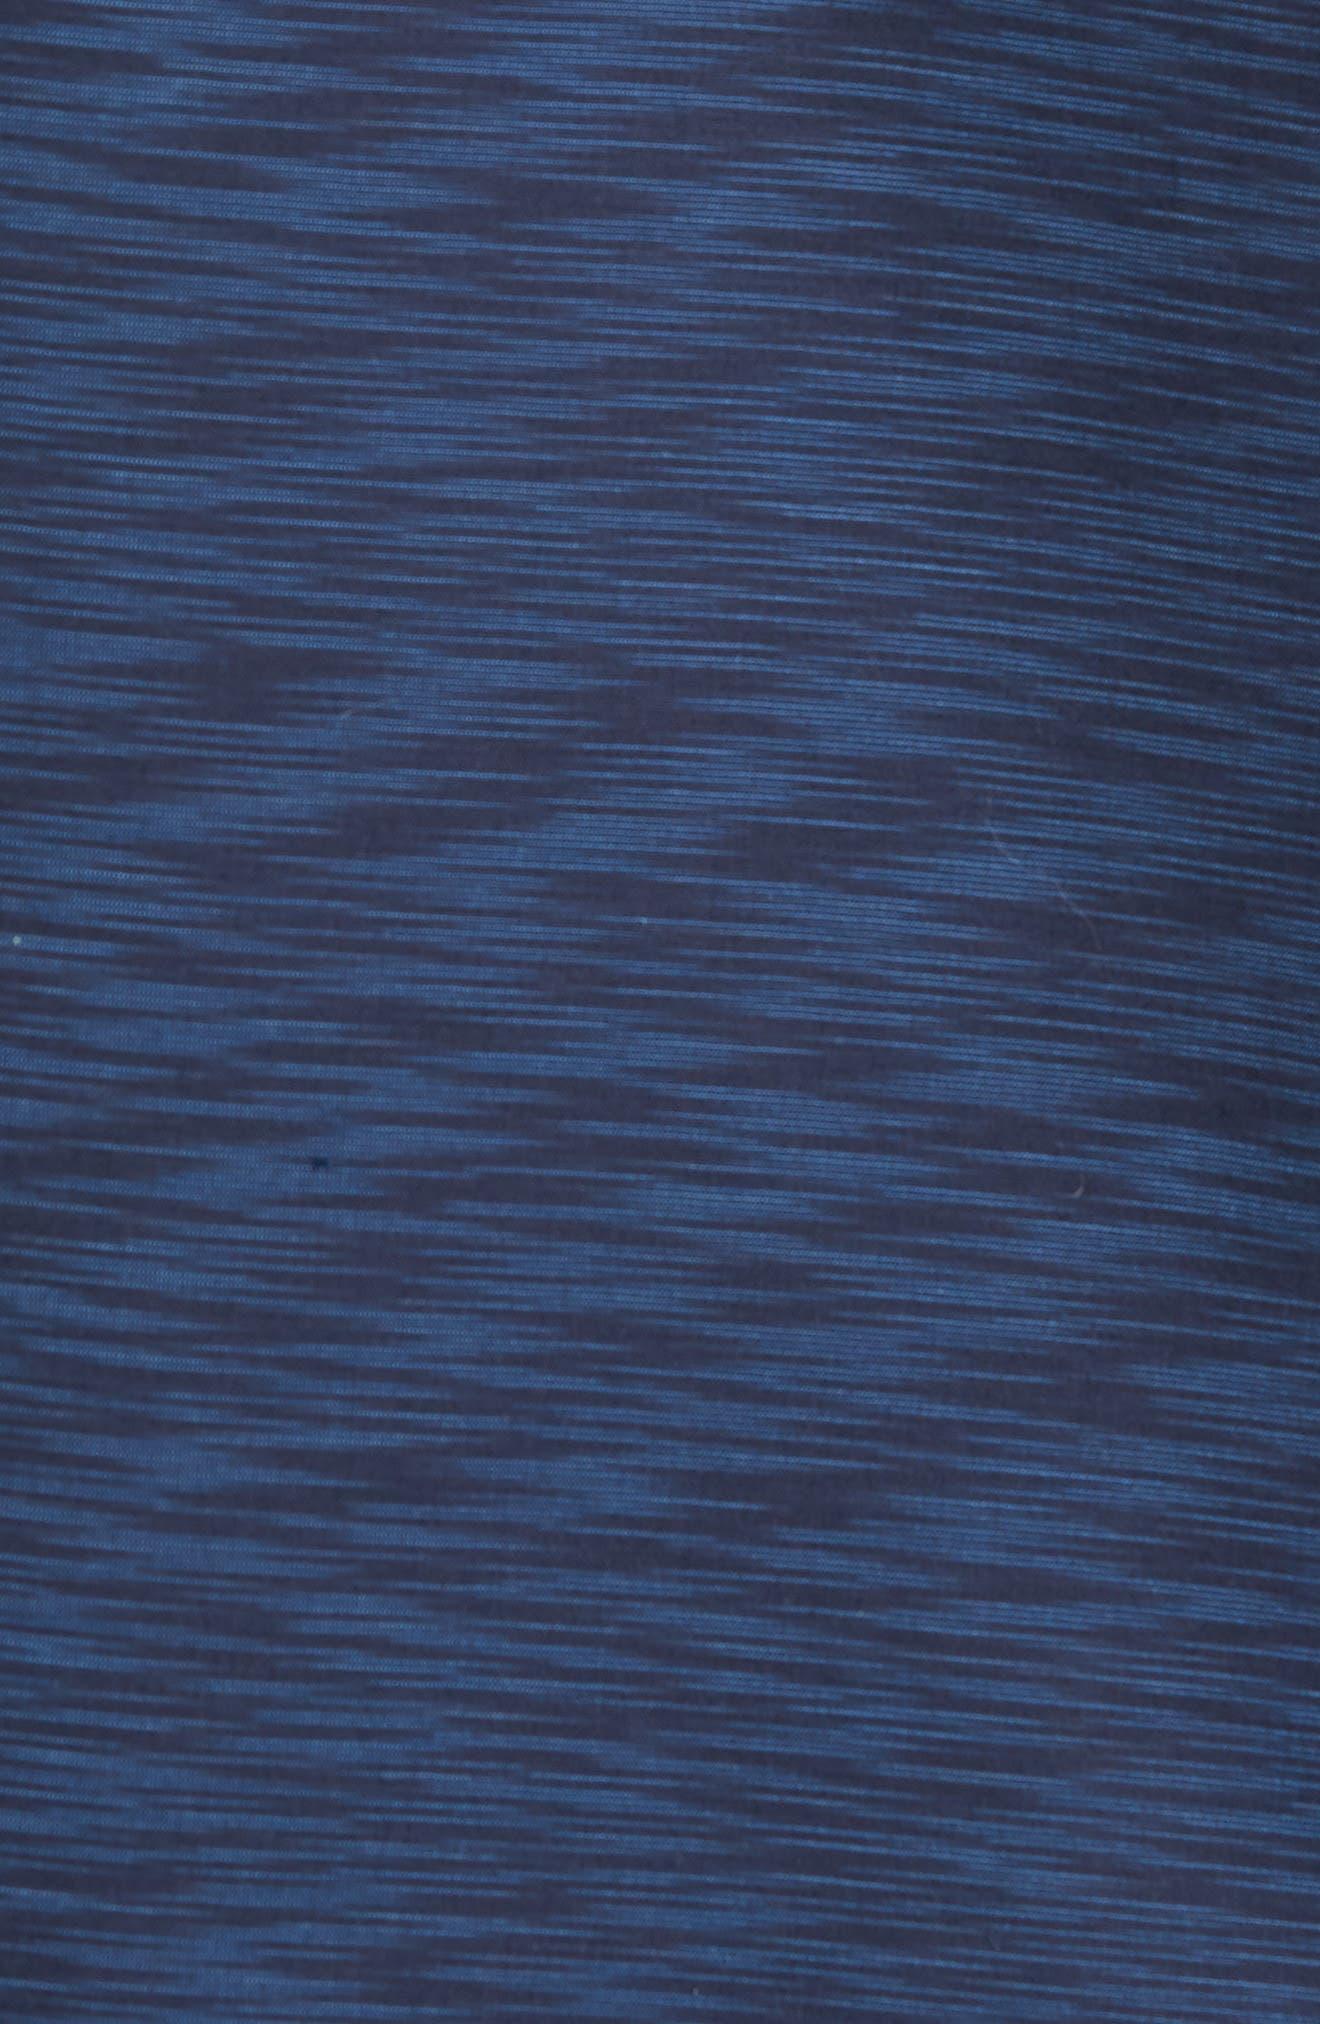 Trim Fit Solid Sport Shirt,                             Alternate thumbnail 5, color,                             Navy Blue Space Dye